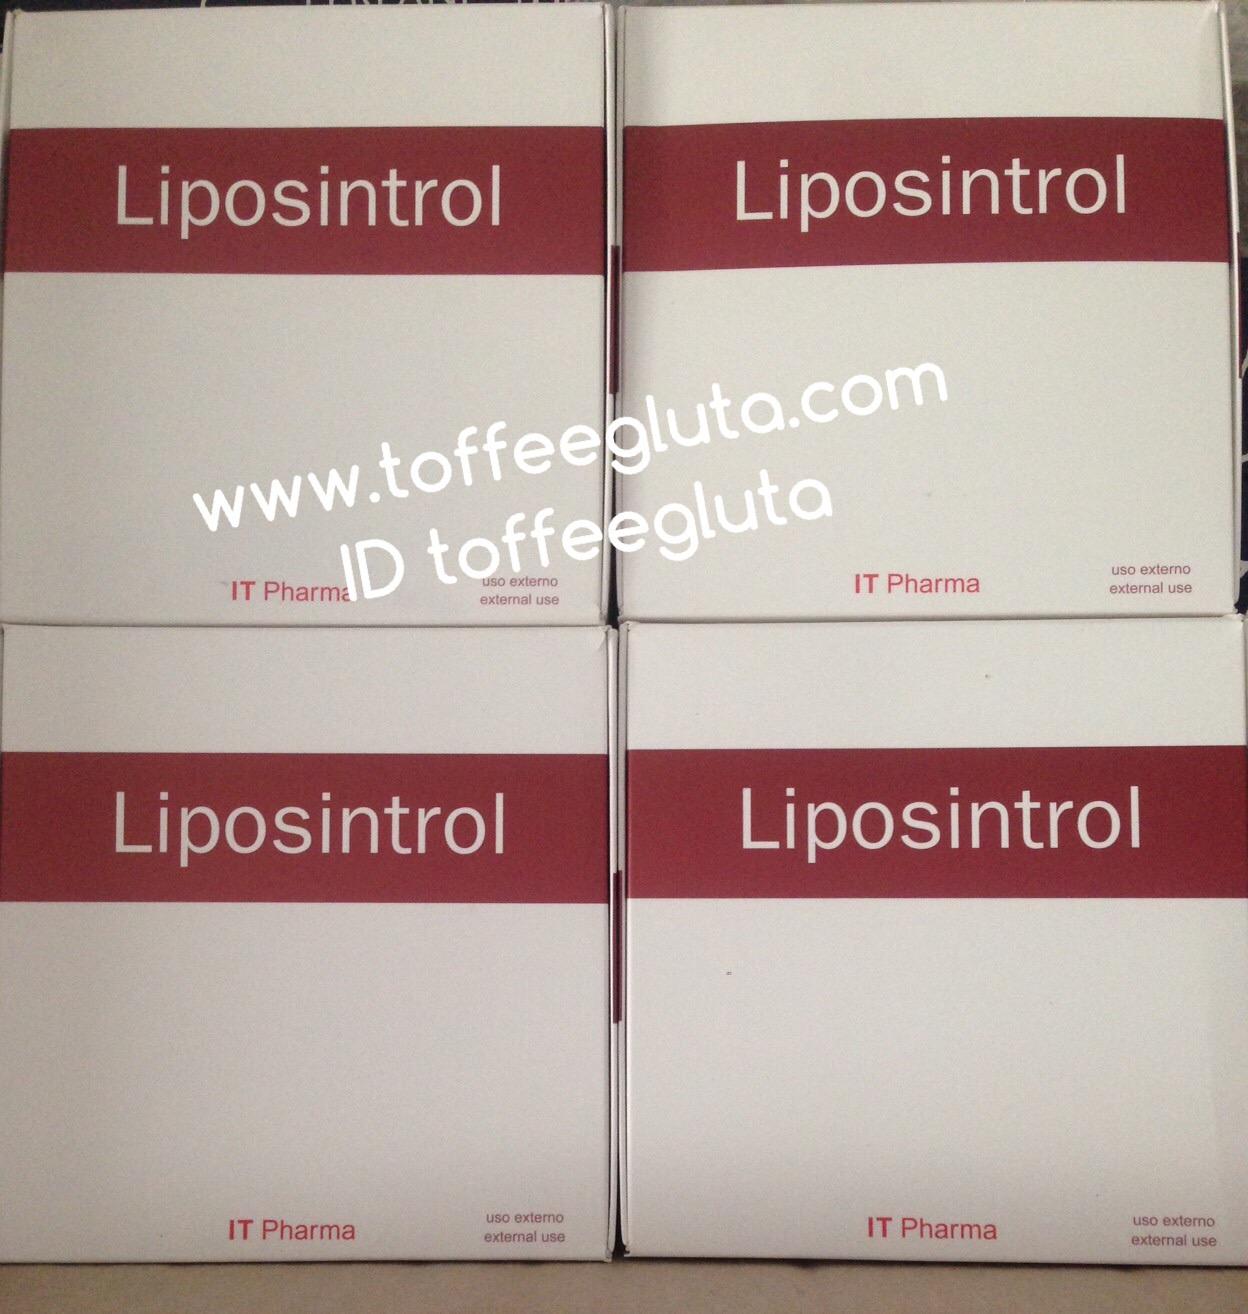 Liposintrol (Spain)